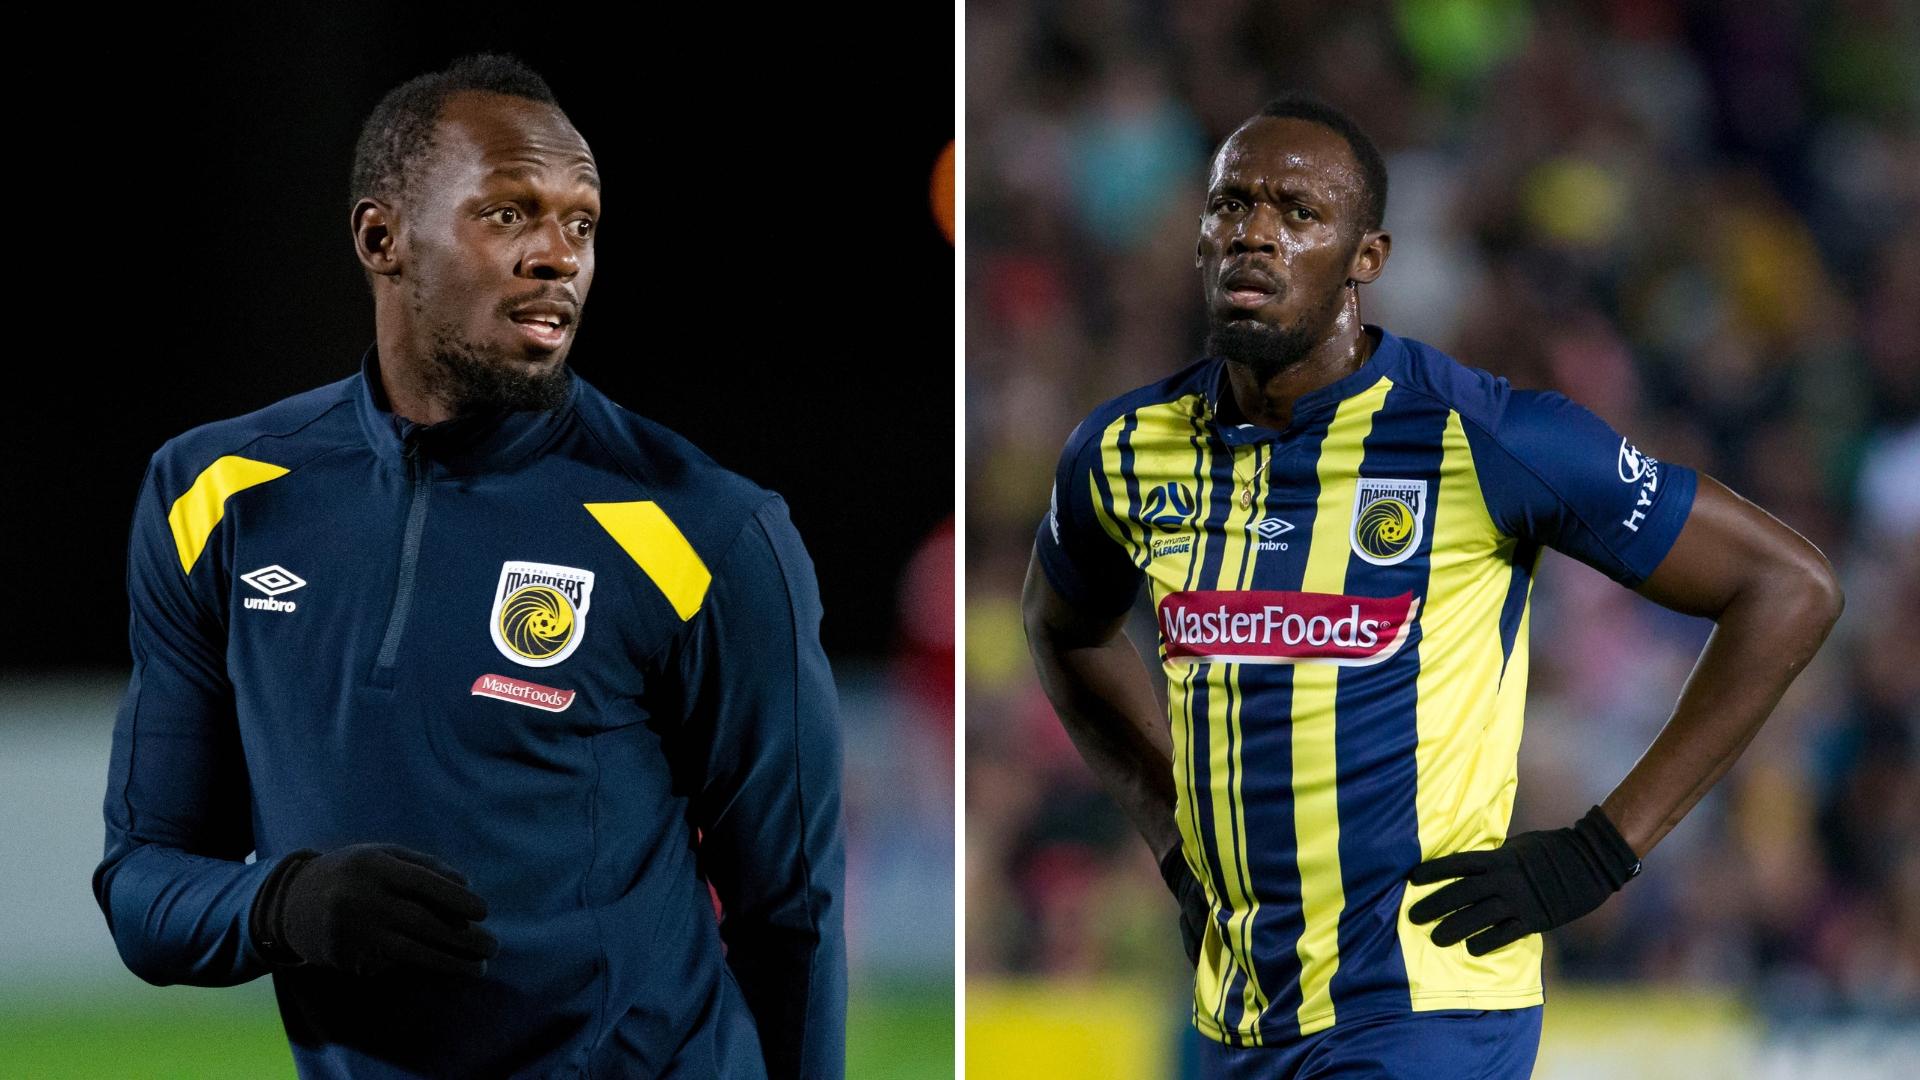 Former Liverpool Player Slams Usain Bolt For Playing Football